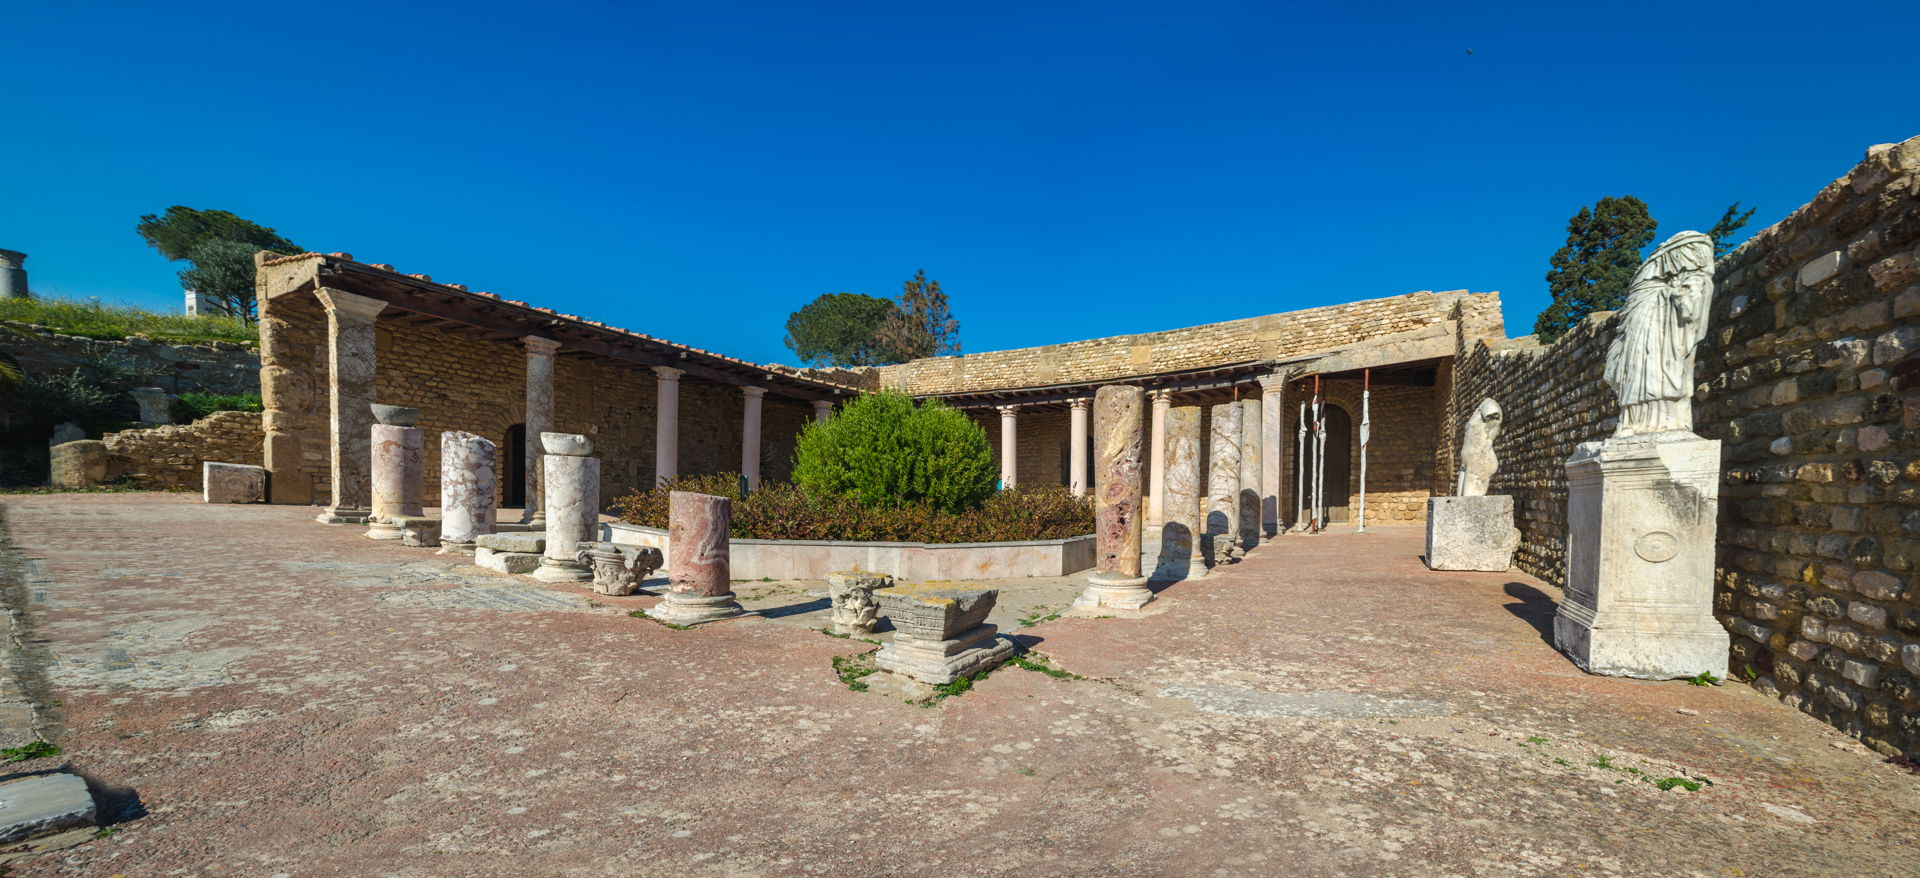 Villa of the Aviary, hadrian villa tunisia, roman villa, roman villas carthage, what to do in carthage tunisia, sightseeing carthage, punic civilization, backpacking tunisia, backpacking carthage, guide to carthage, how to visit carthage